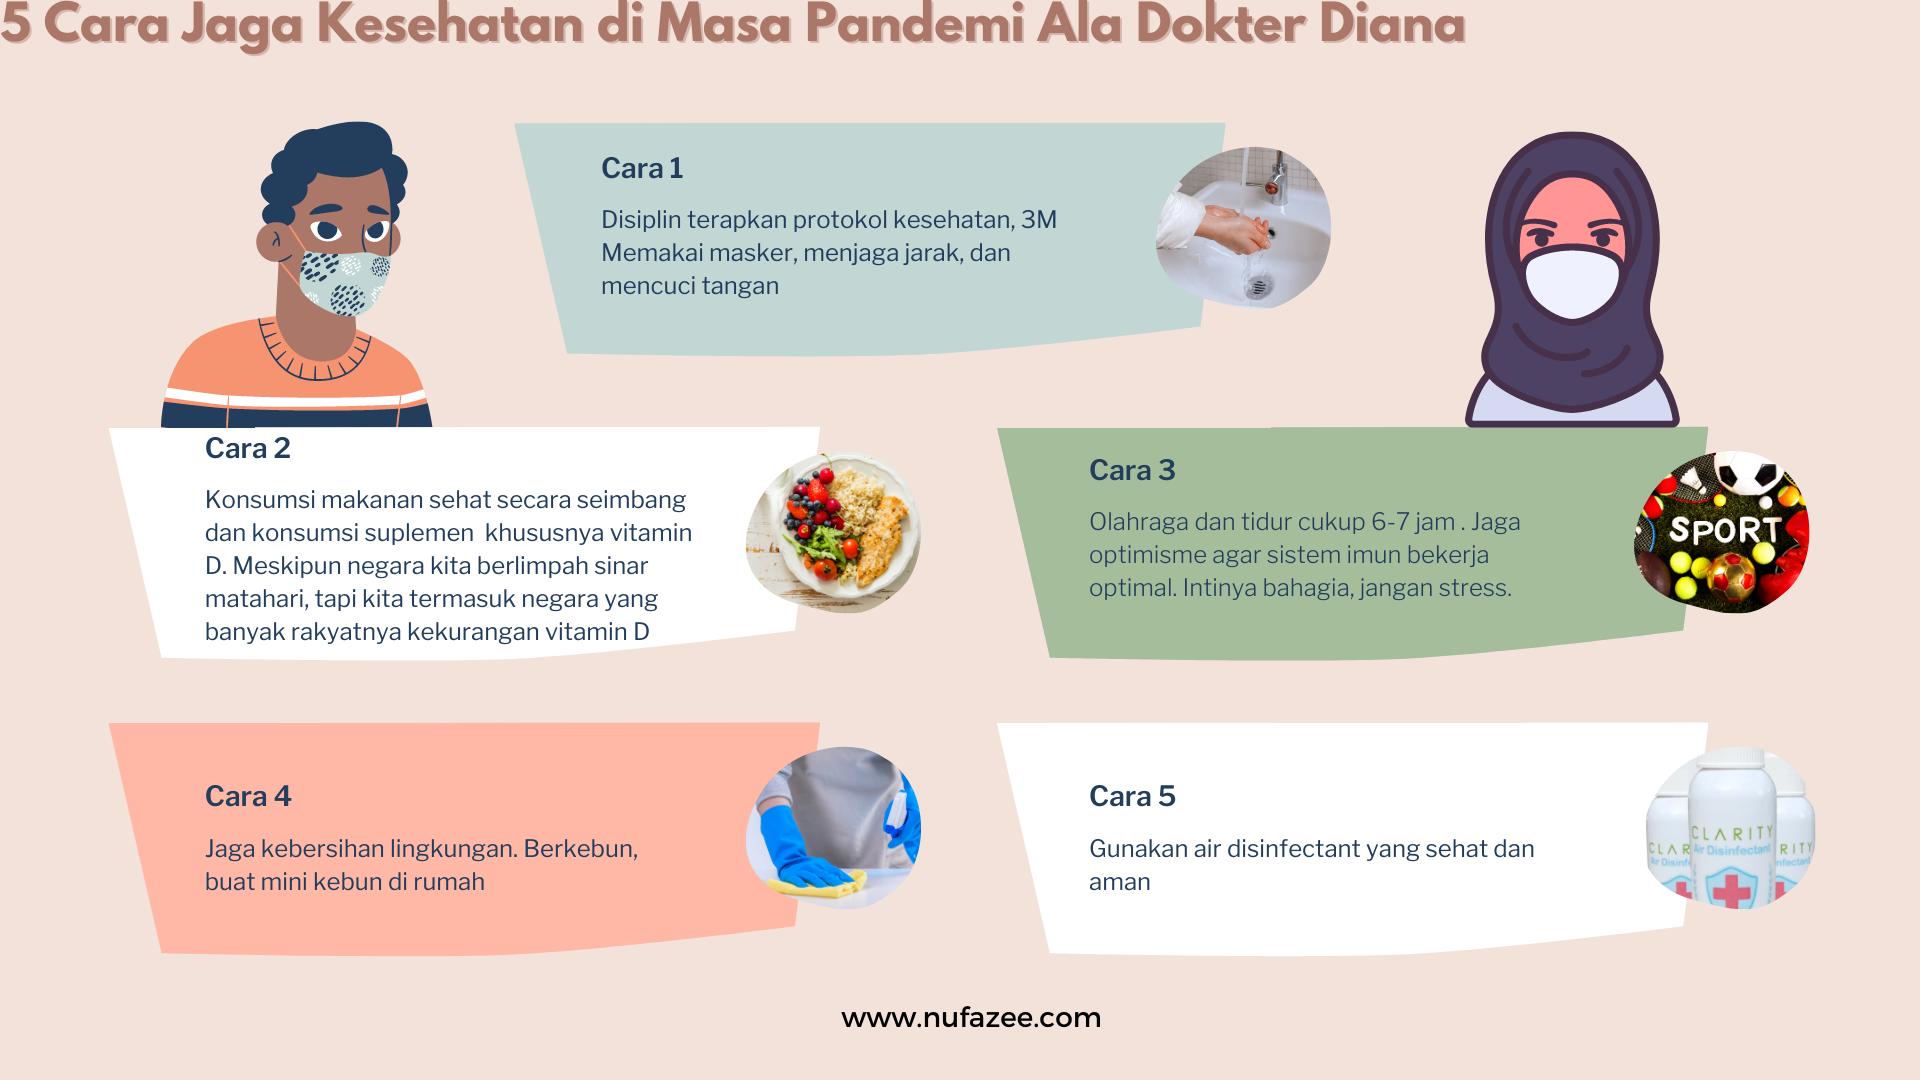 Clarity Air Disinfectant 1